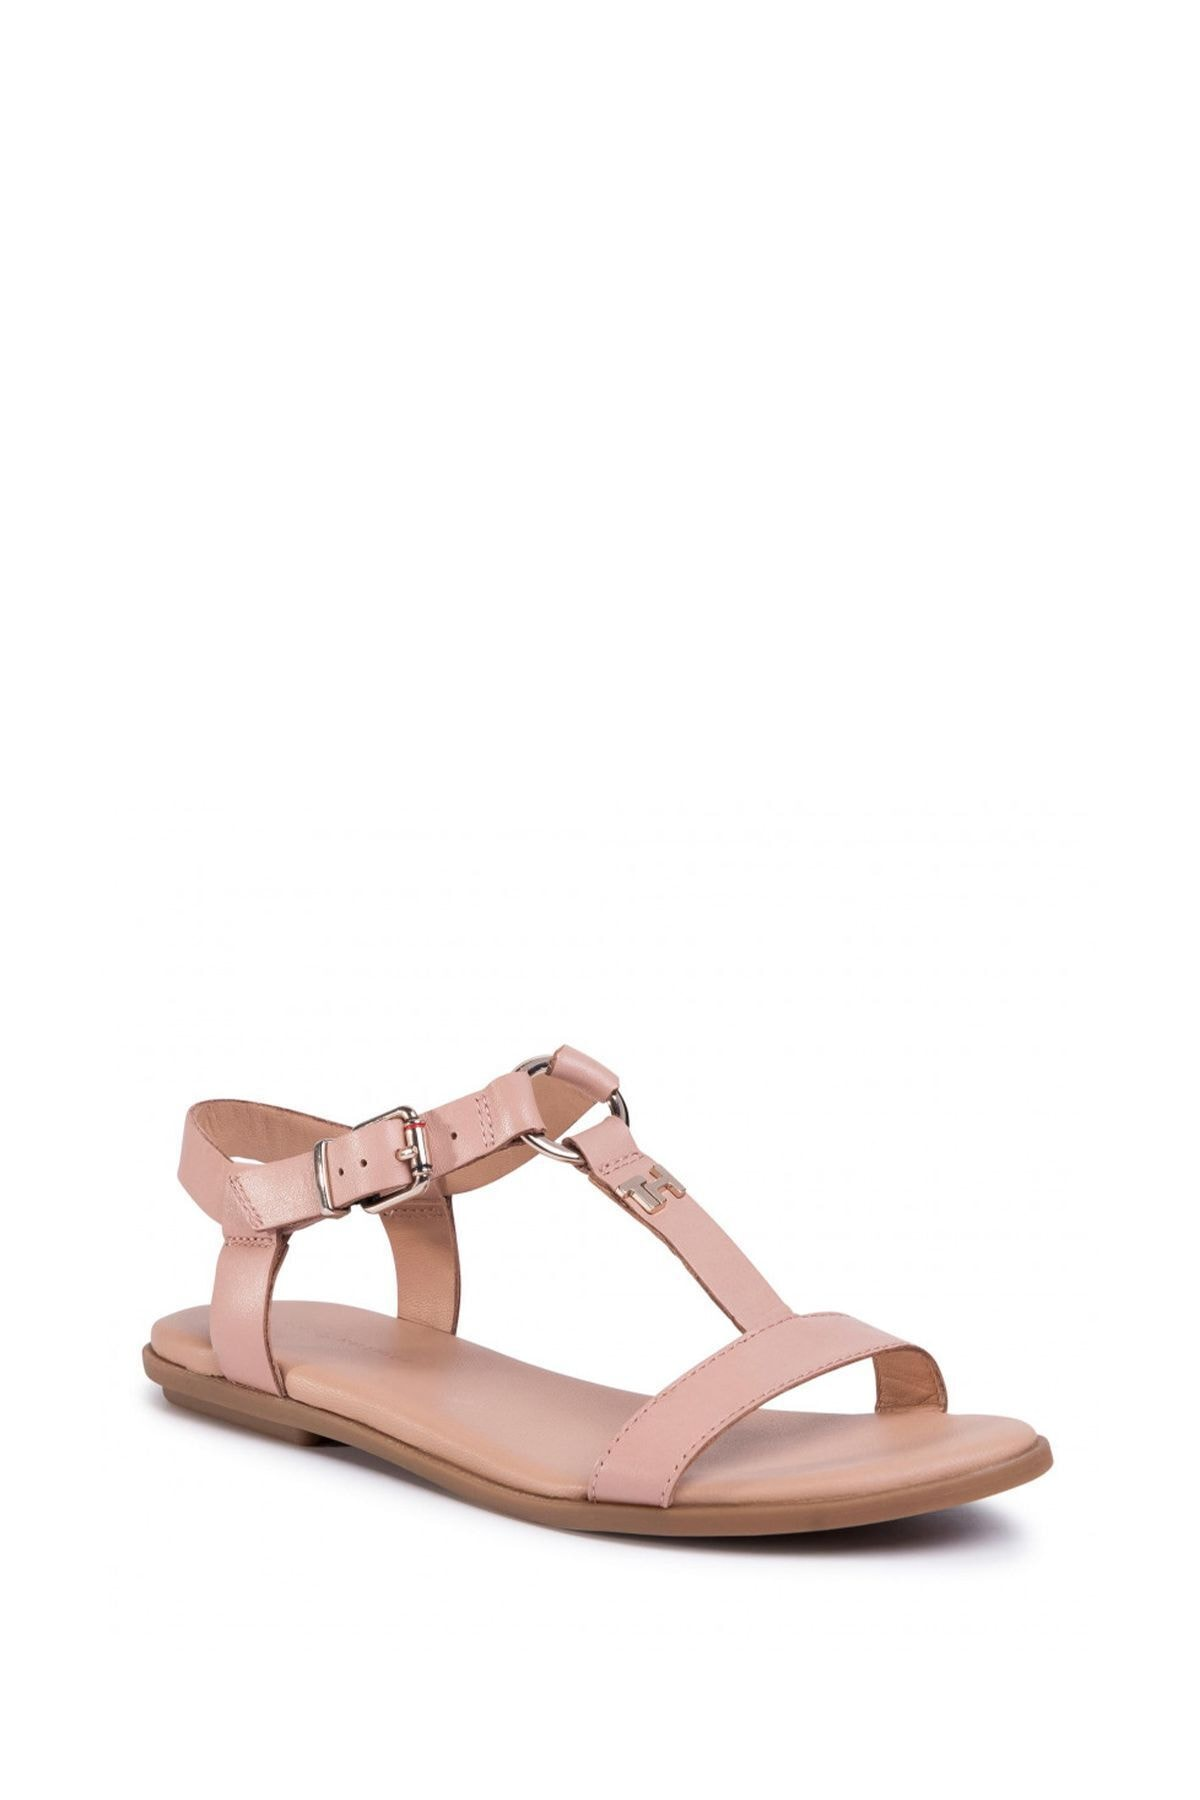 Tommy Hilfiger Kadın Bej Feminine Leather Flat Sandalet Fw0fw04882 1